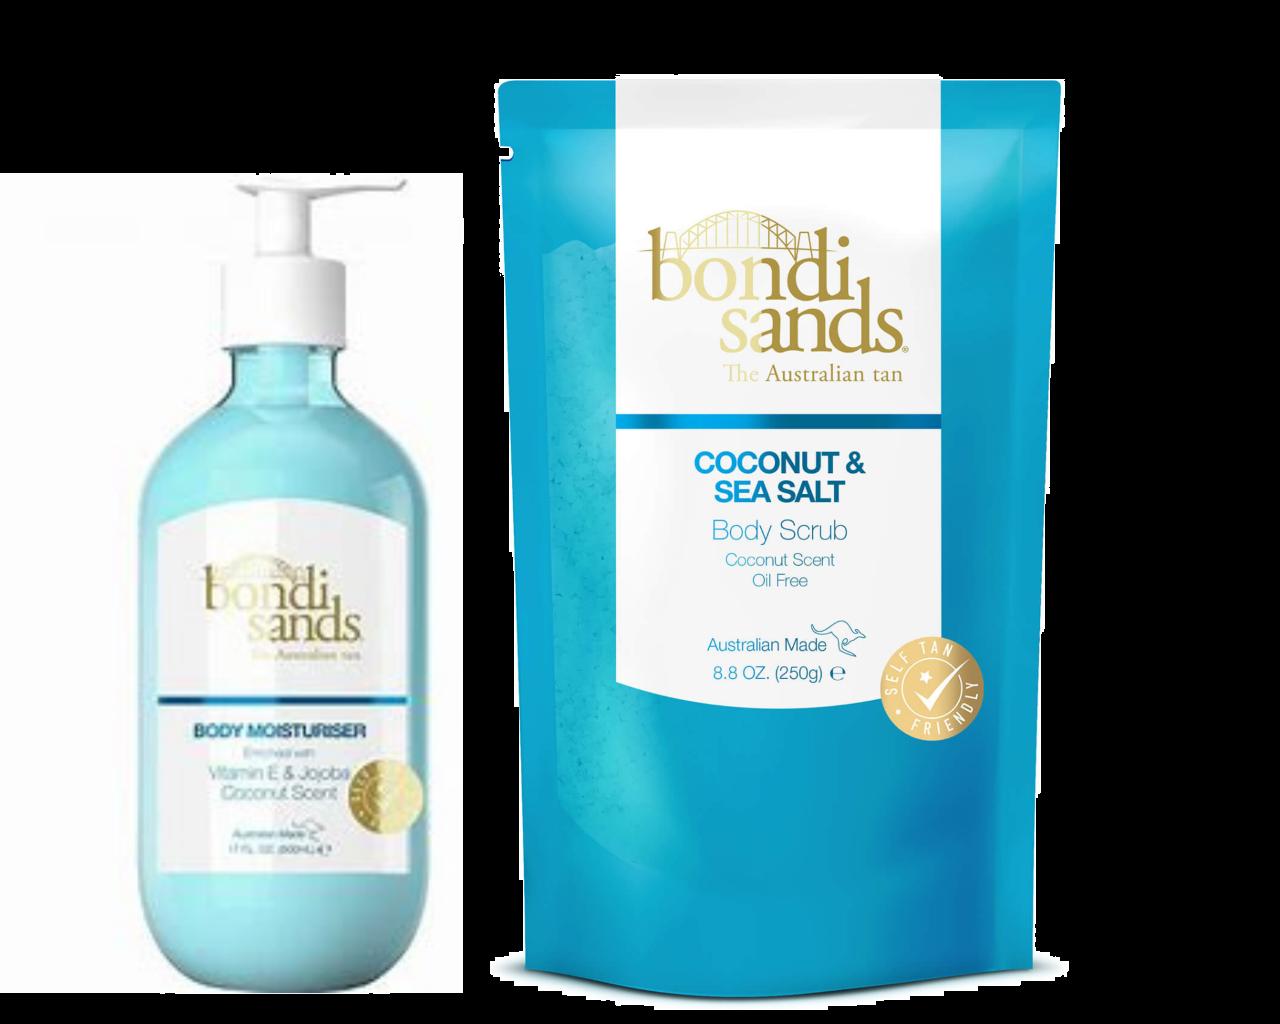 Bondi Sands Body Scrub Coconut and Sea Salt 250g + Coconut Moisturiser 500ml